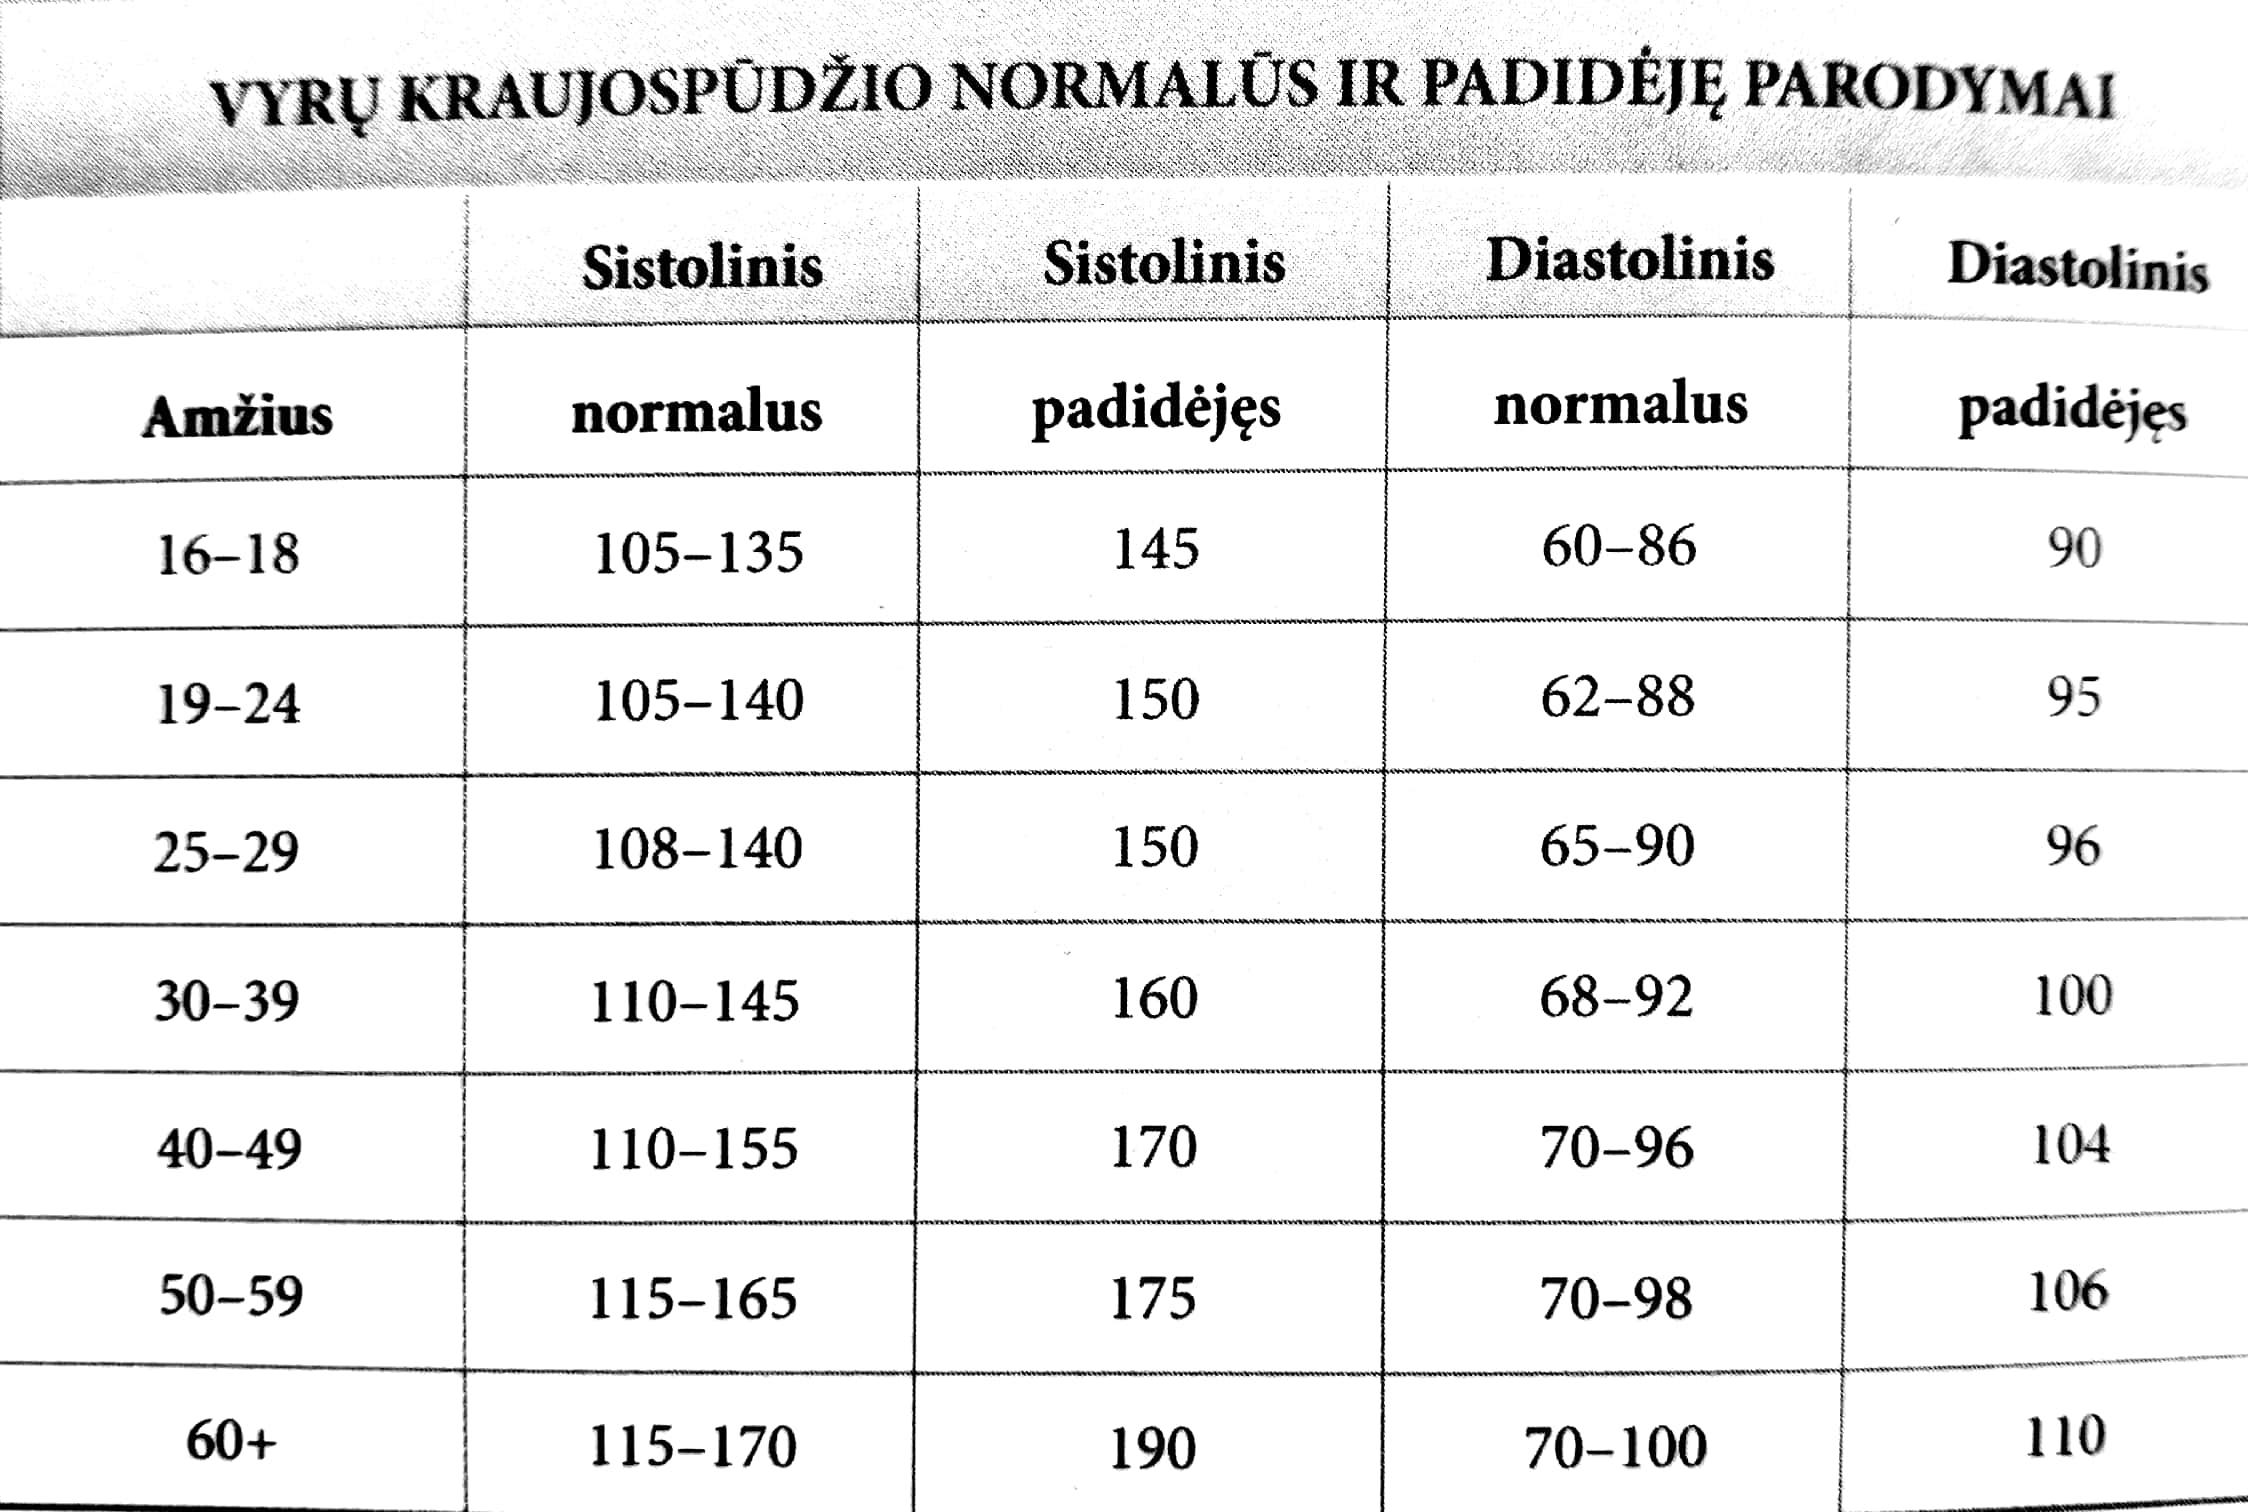 hipertenzija | jusukalve.lt